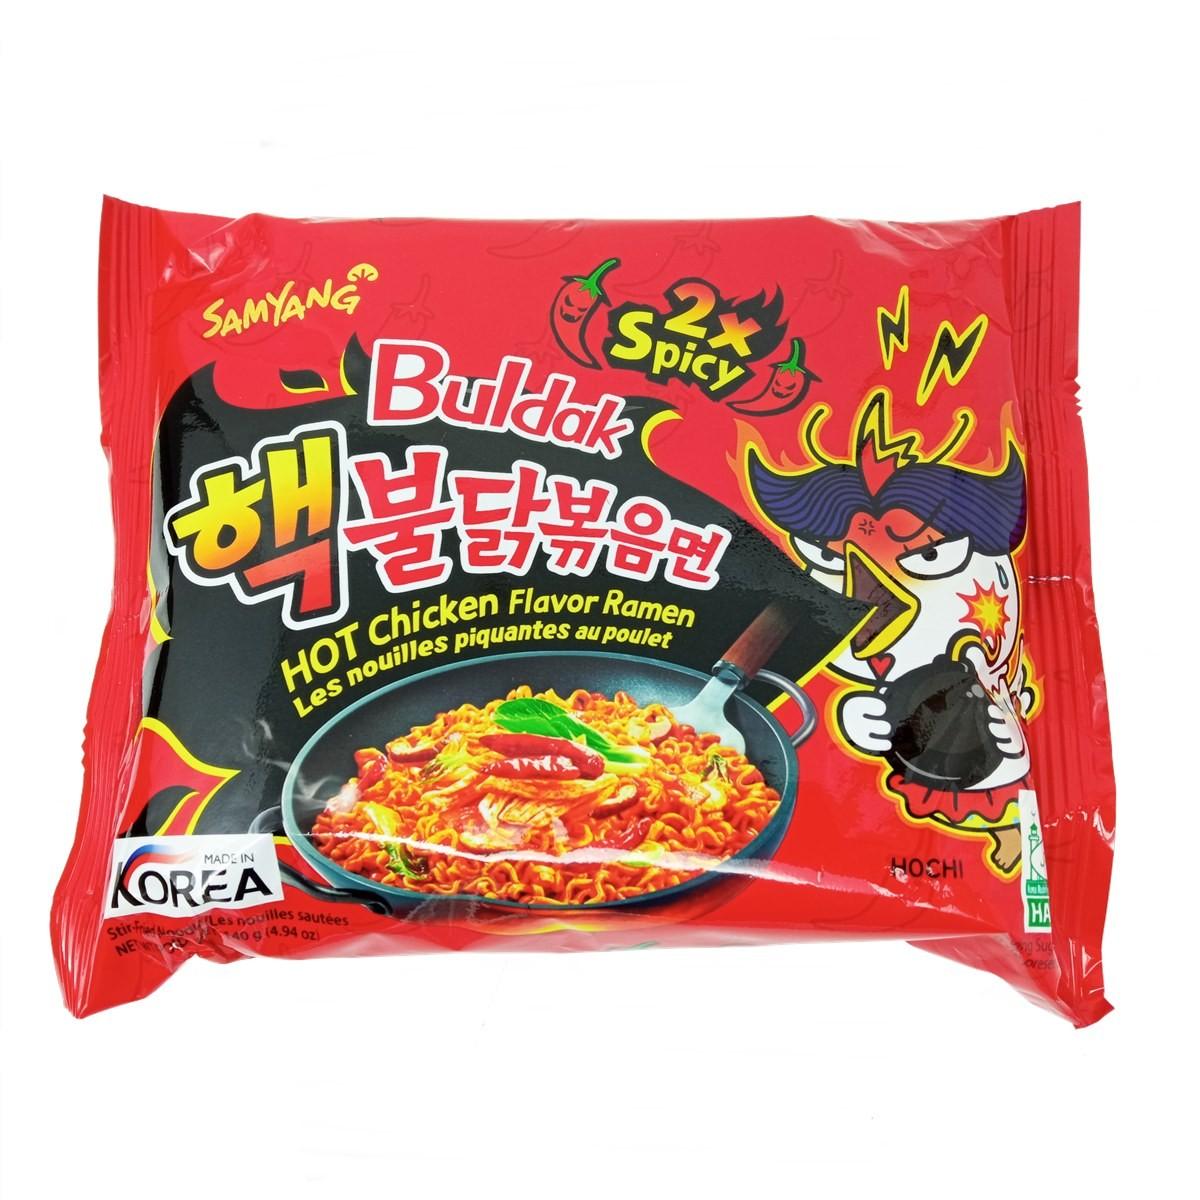 Macarrão Lamen Coreano Hot Chicken Buldak x2Spicy 140g - Samyang